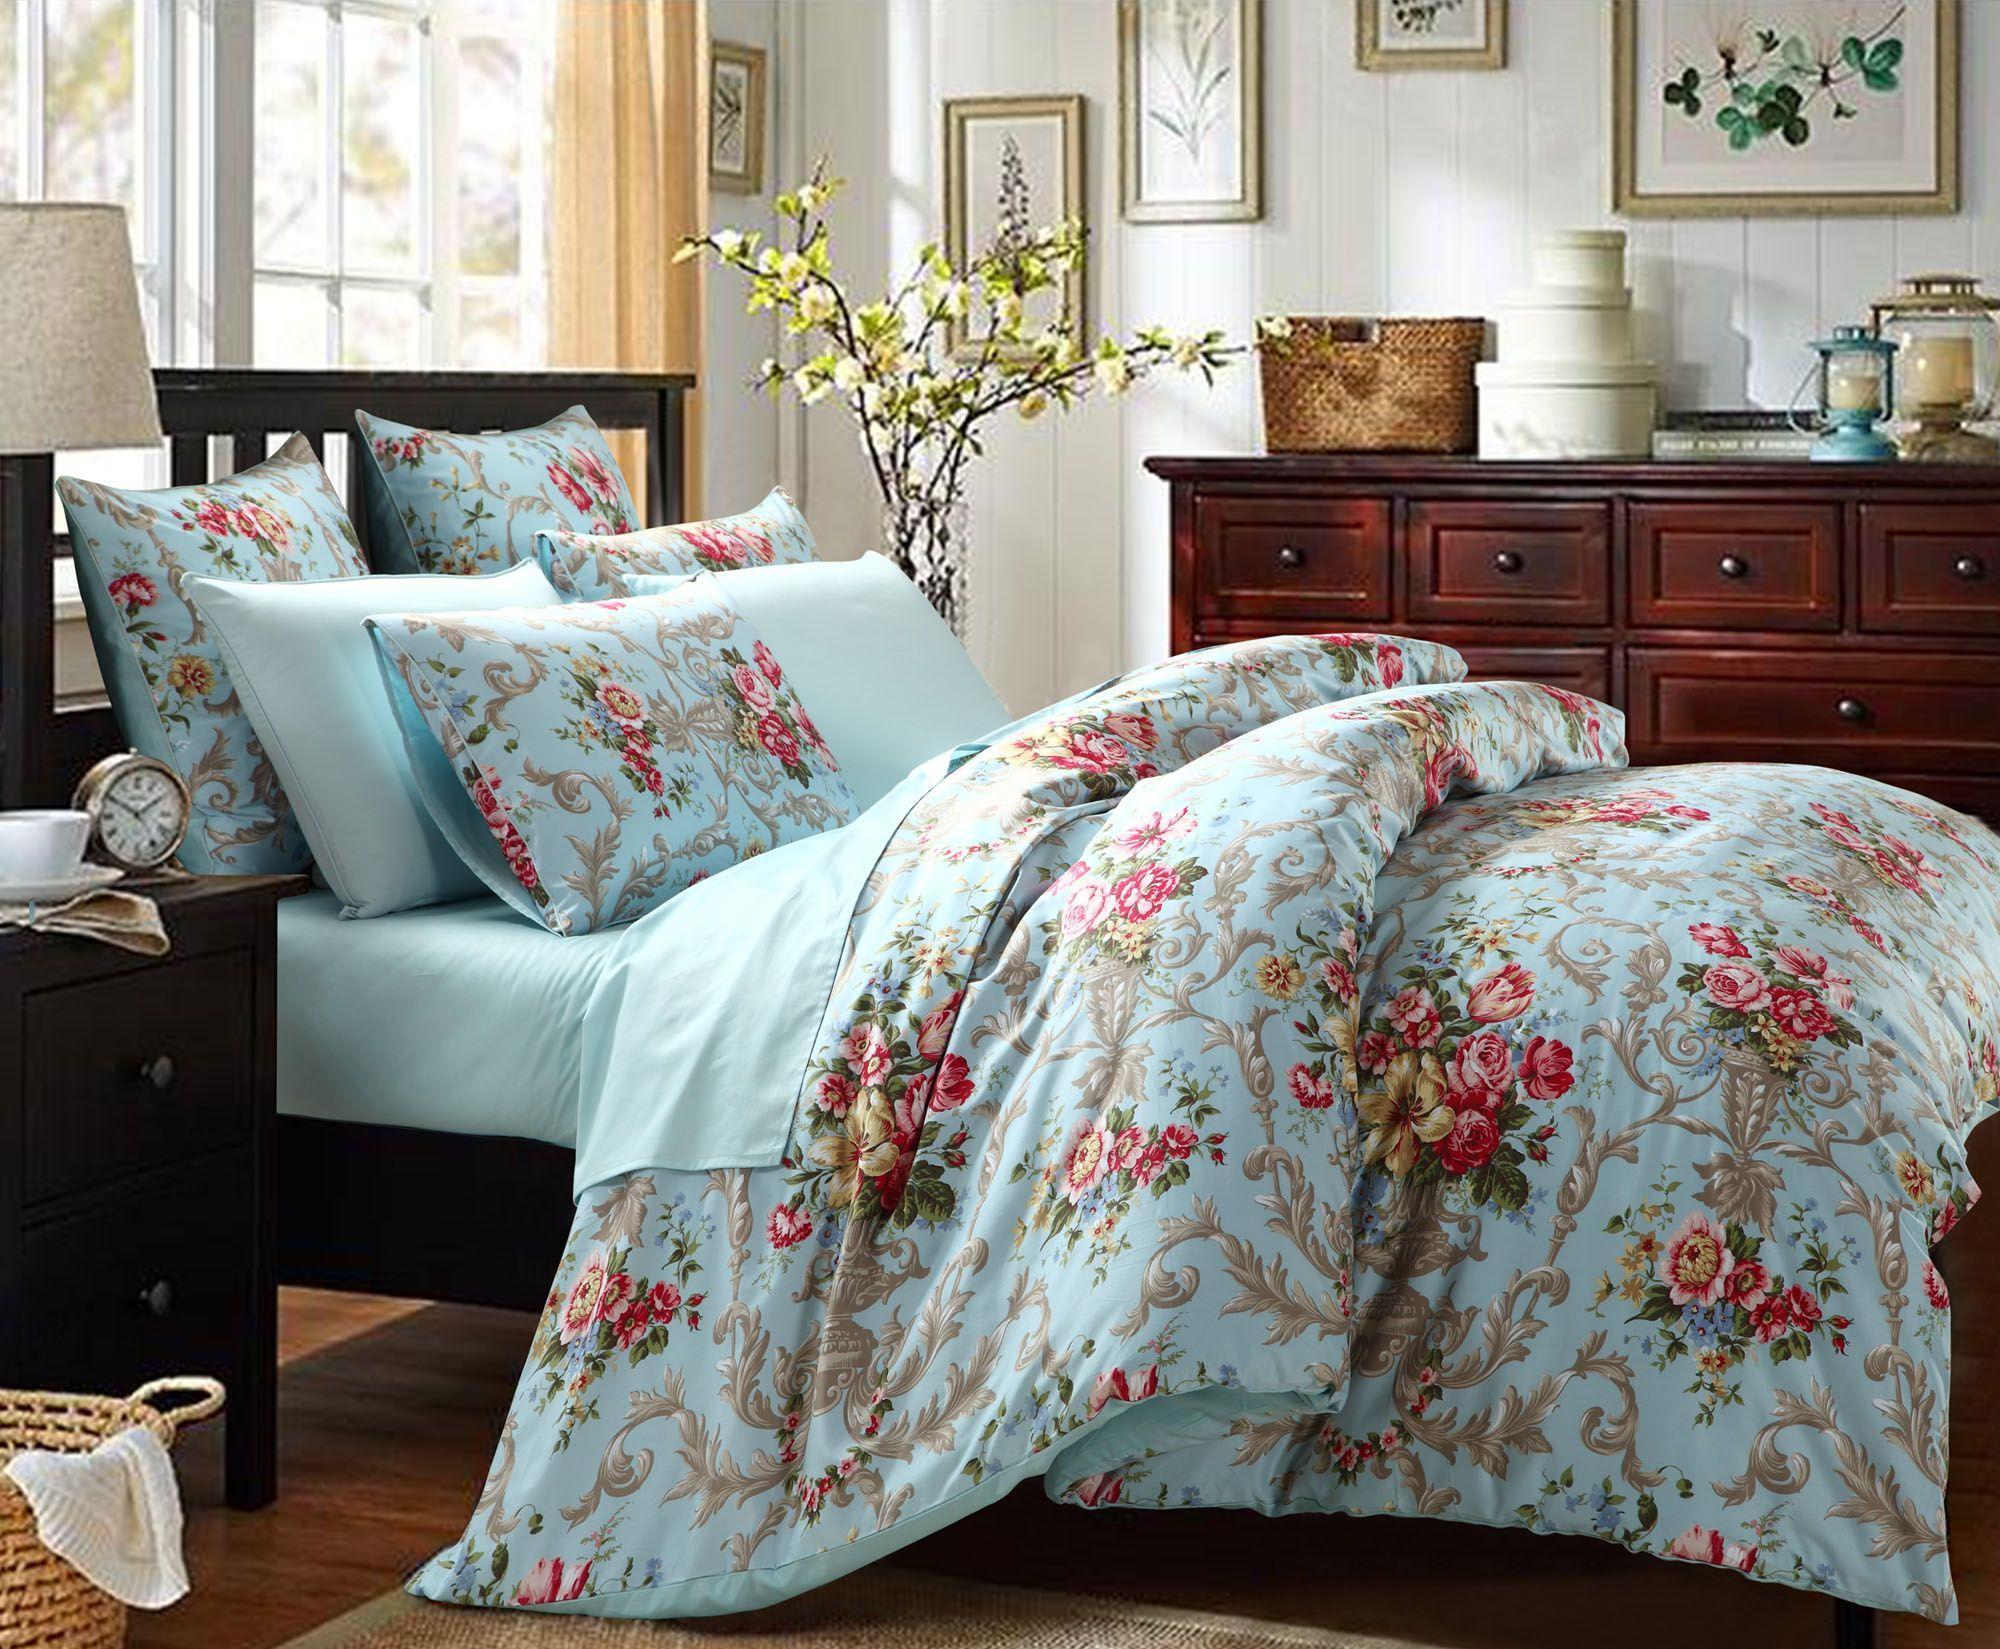 Designer bedding sets discount - Cheap Comforter Sets Designer Comforter Sets Discount View